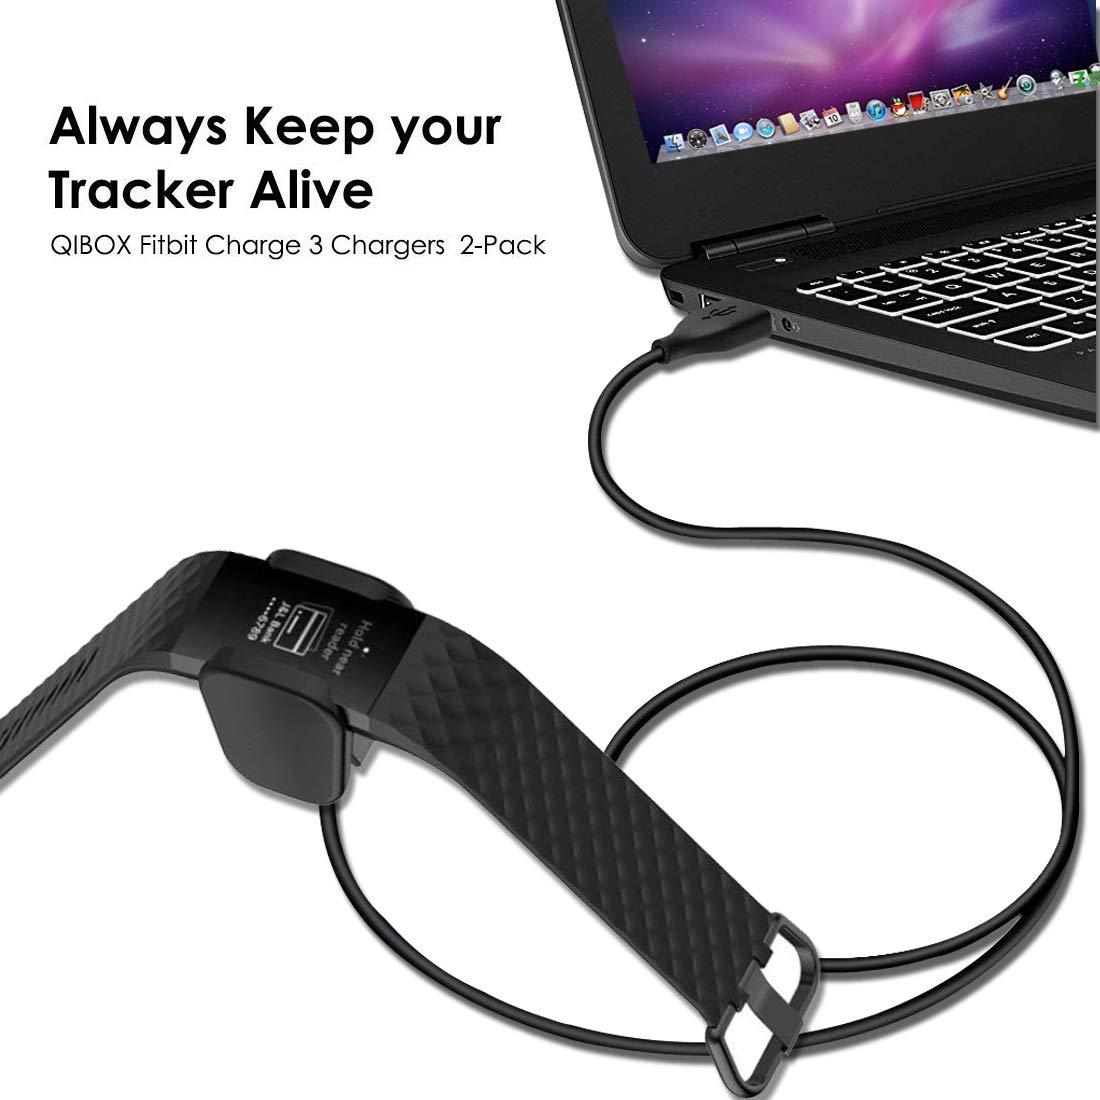 Amazon.com: Fashioneey Clip de carga compatible con Fitbit ...